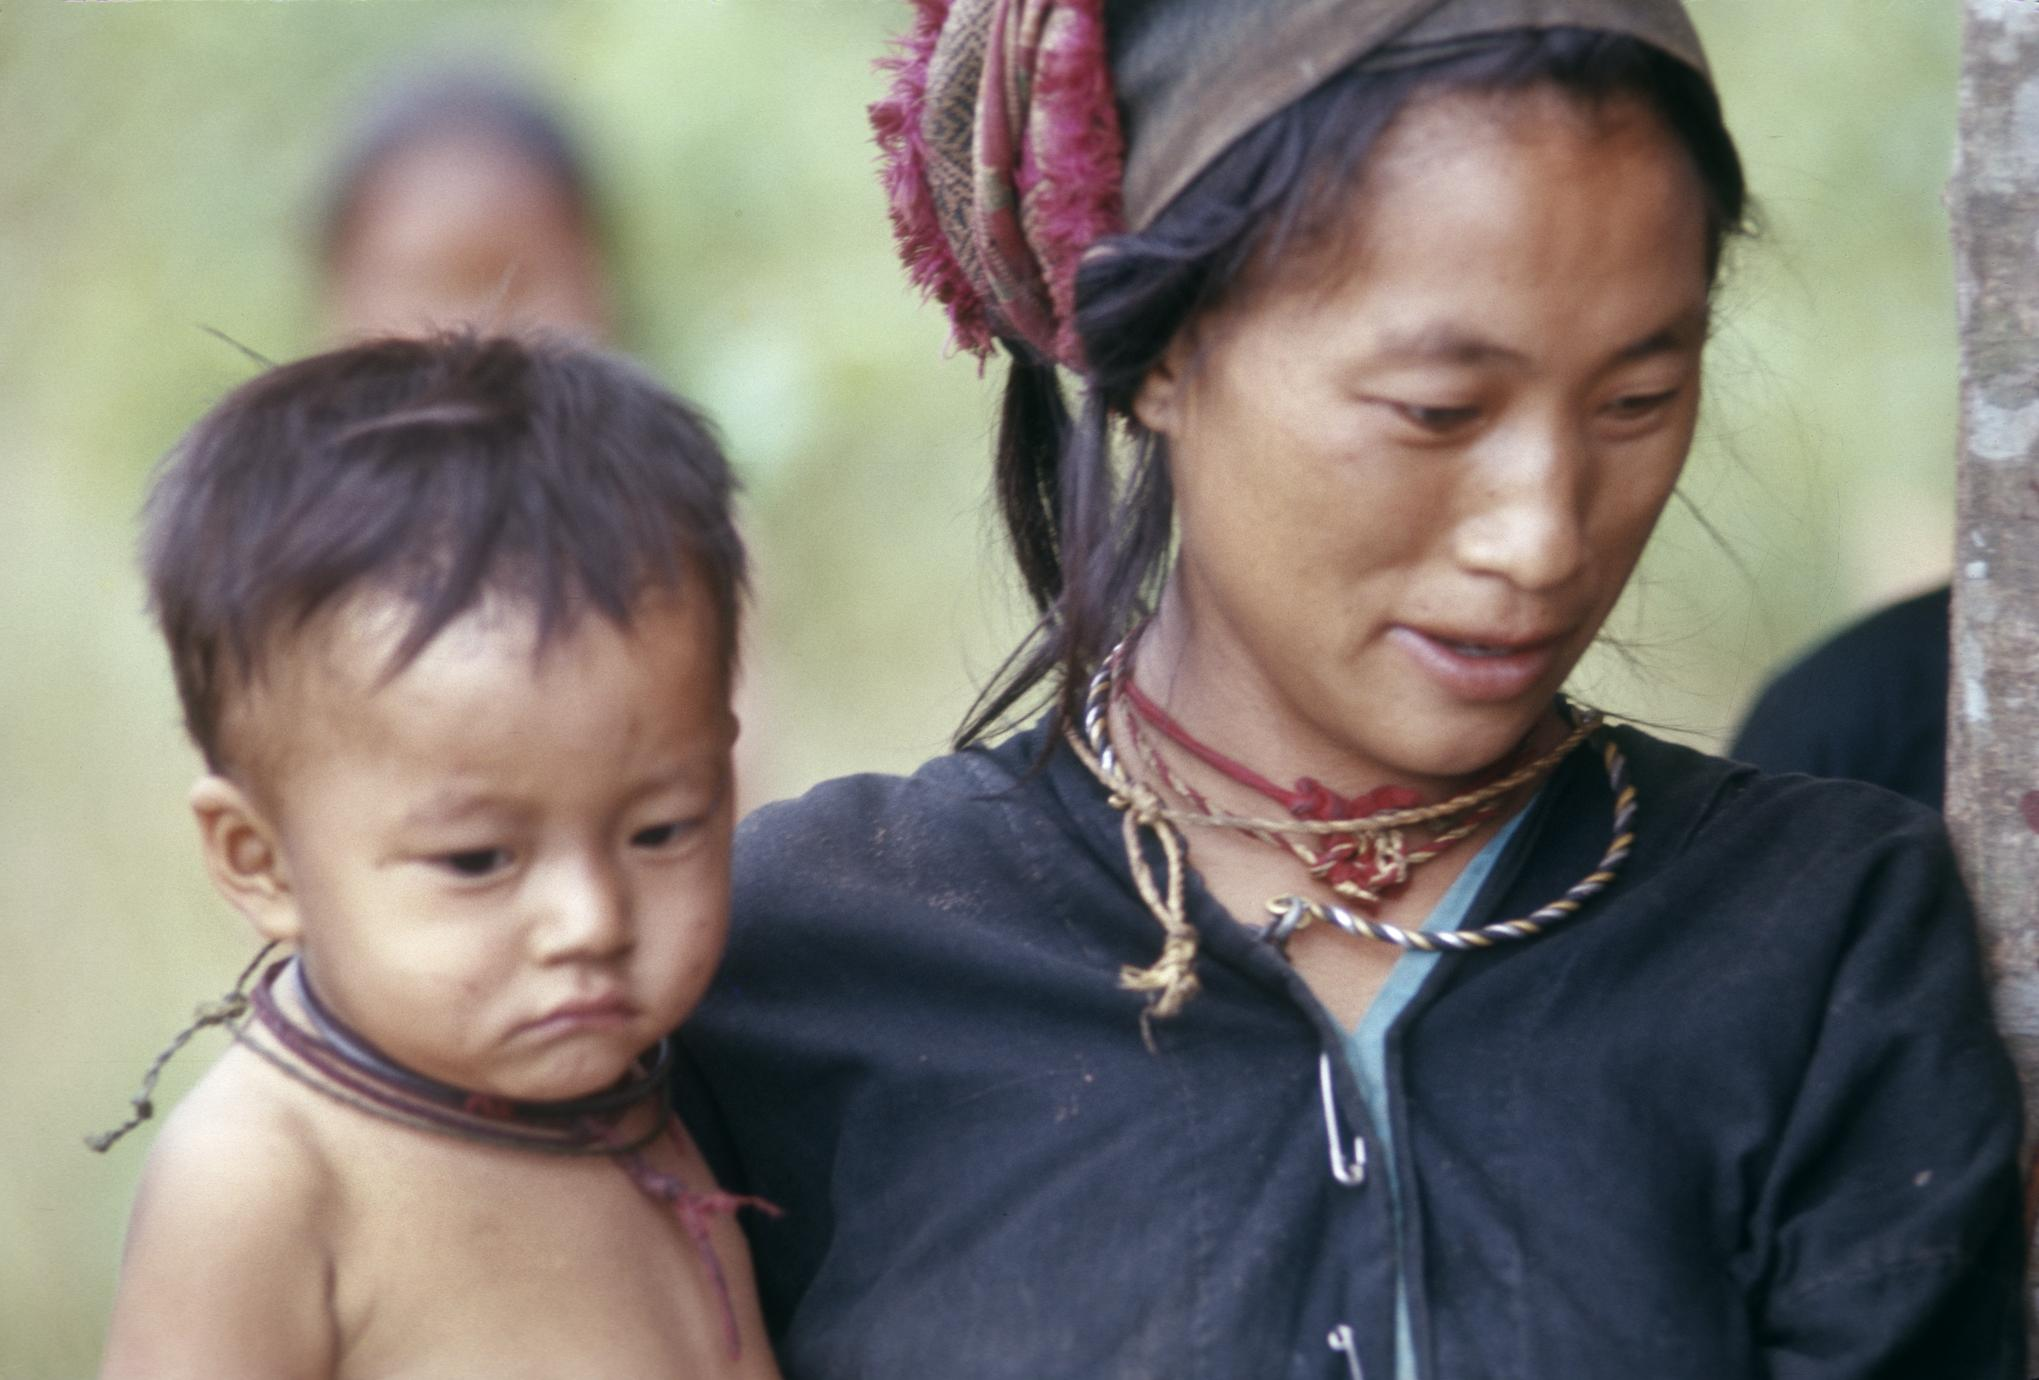 Hmong woman and child